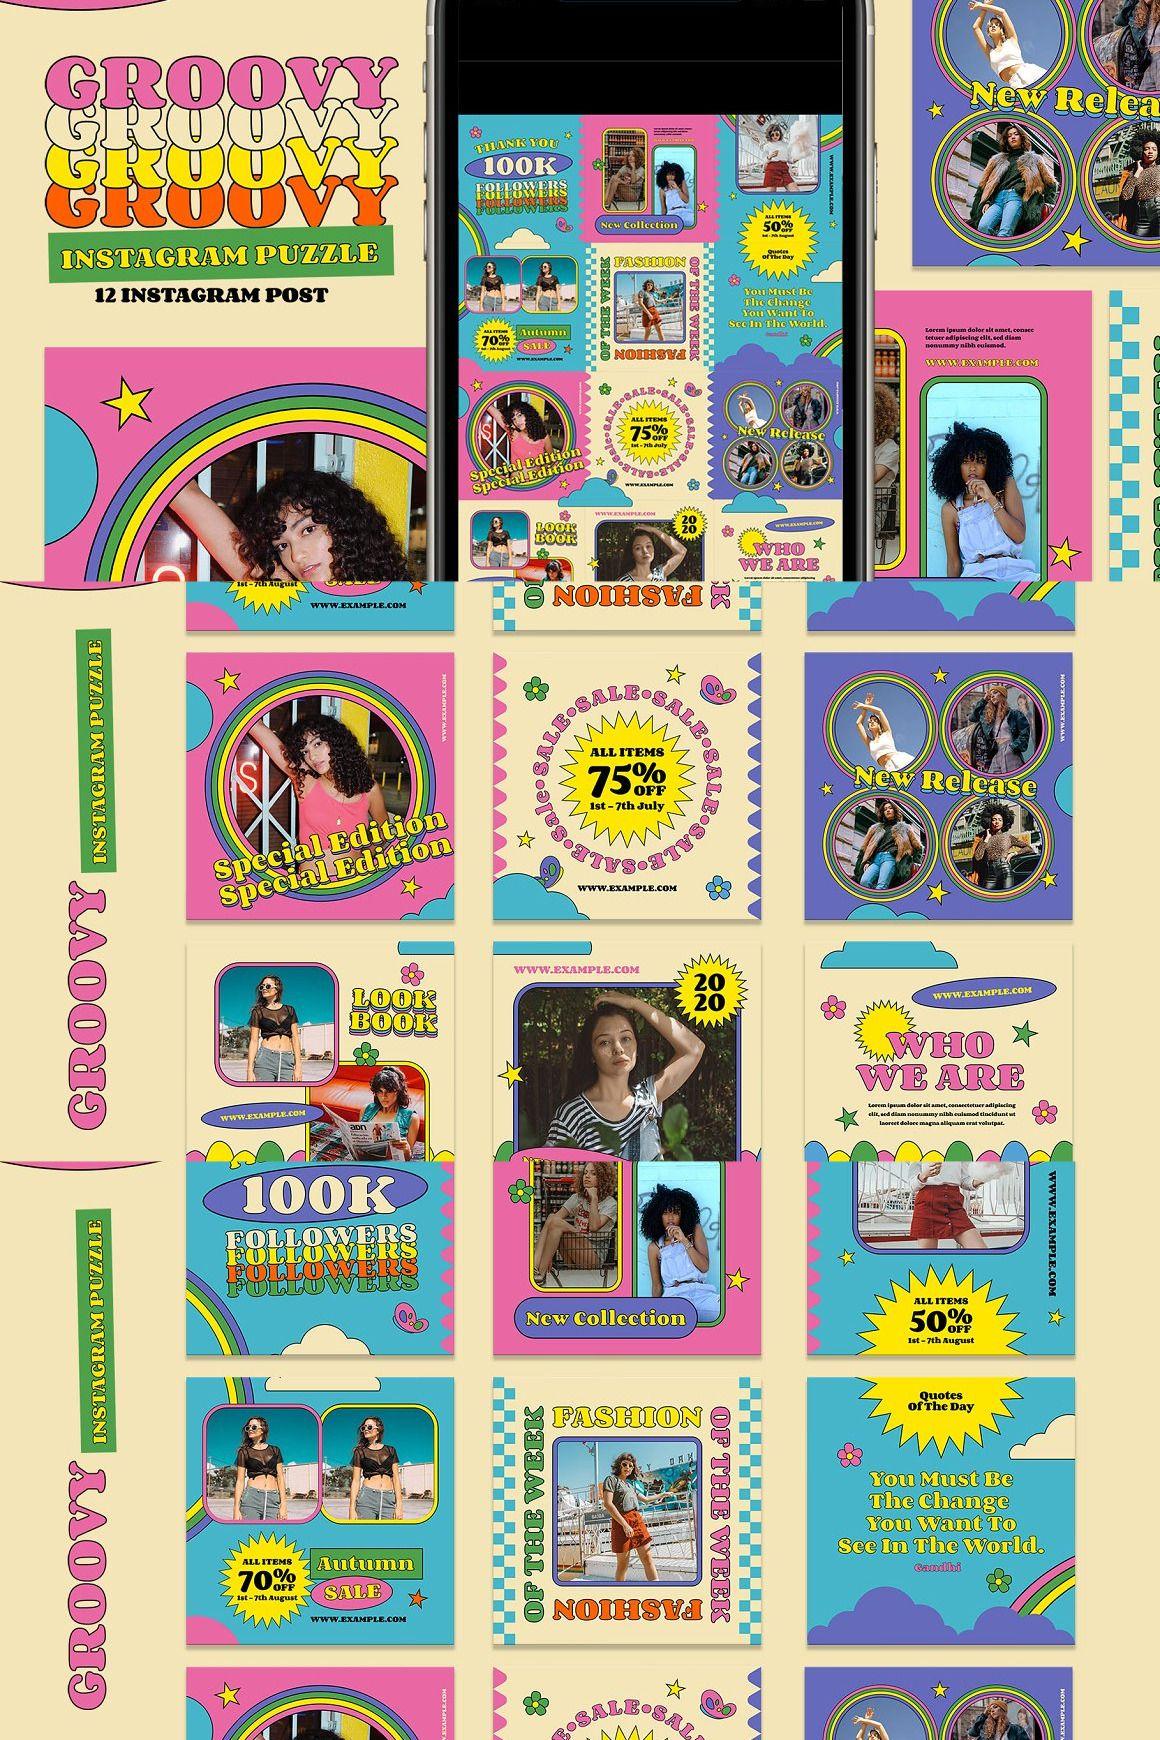 Groovy Instagram Puzzle Graphic design brochure